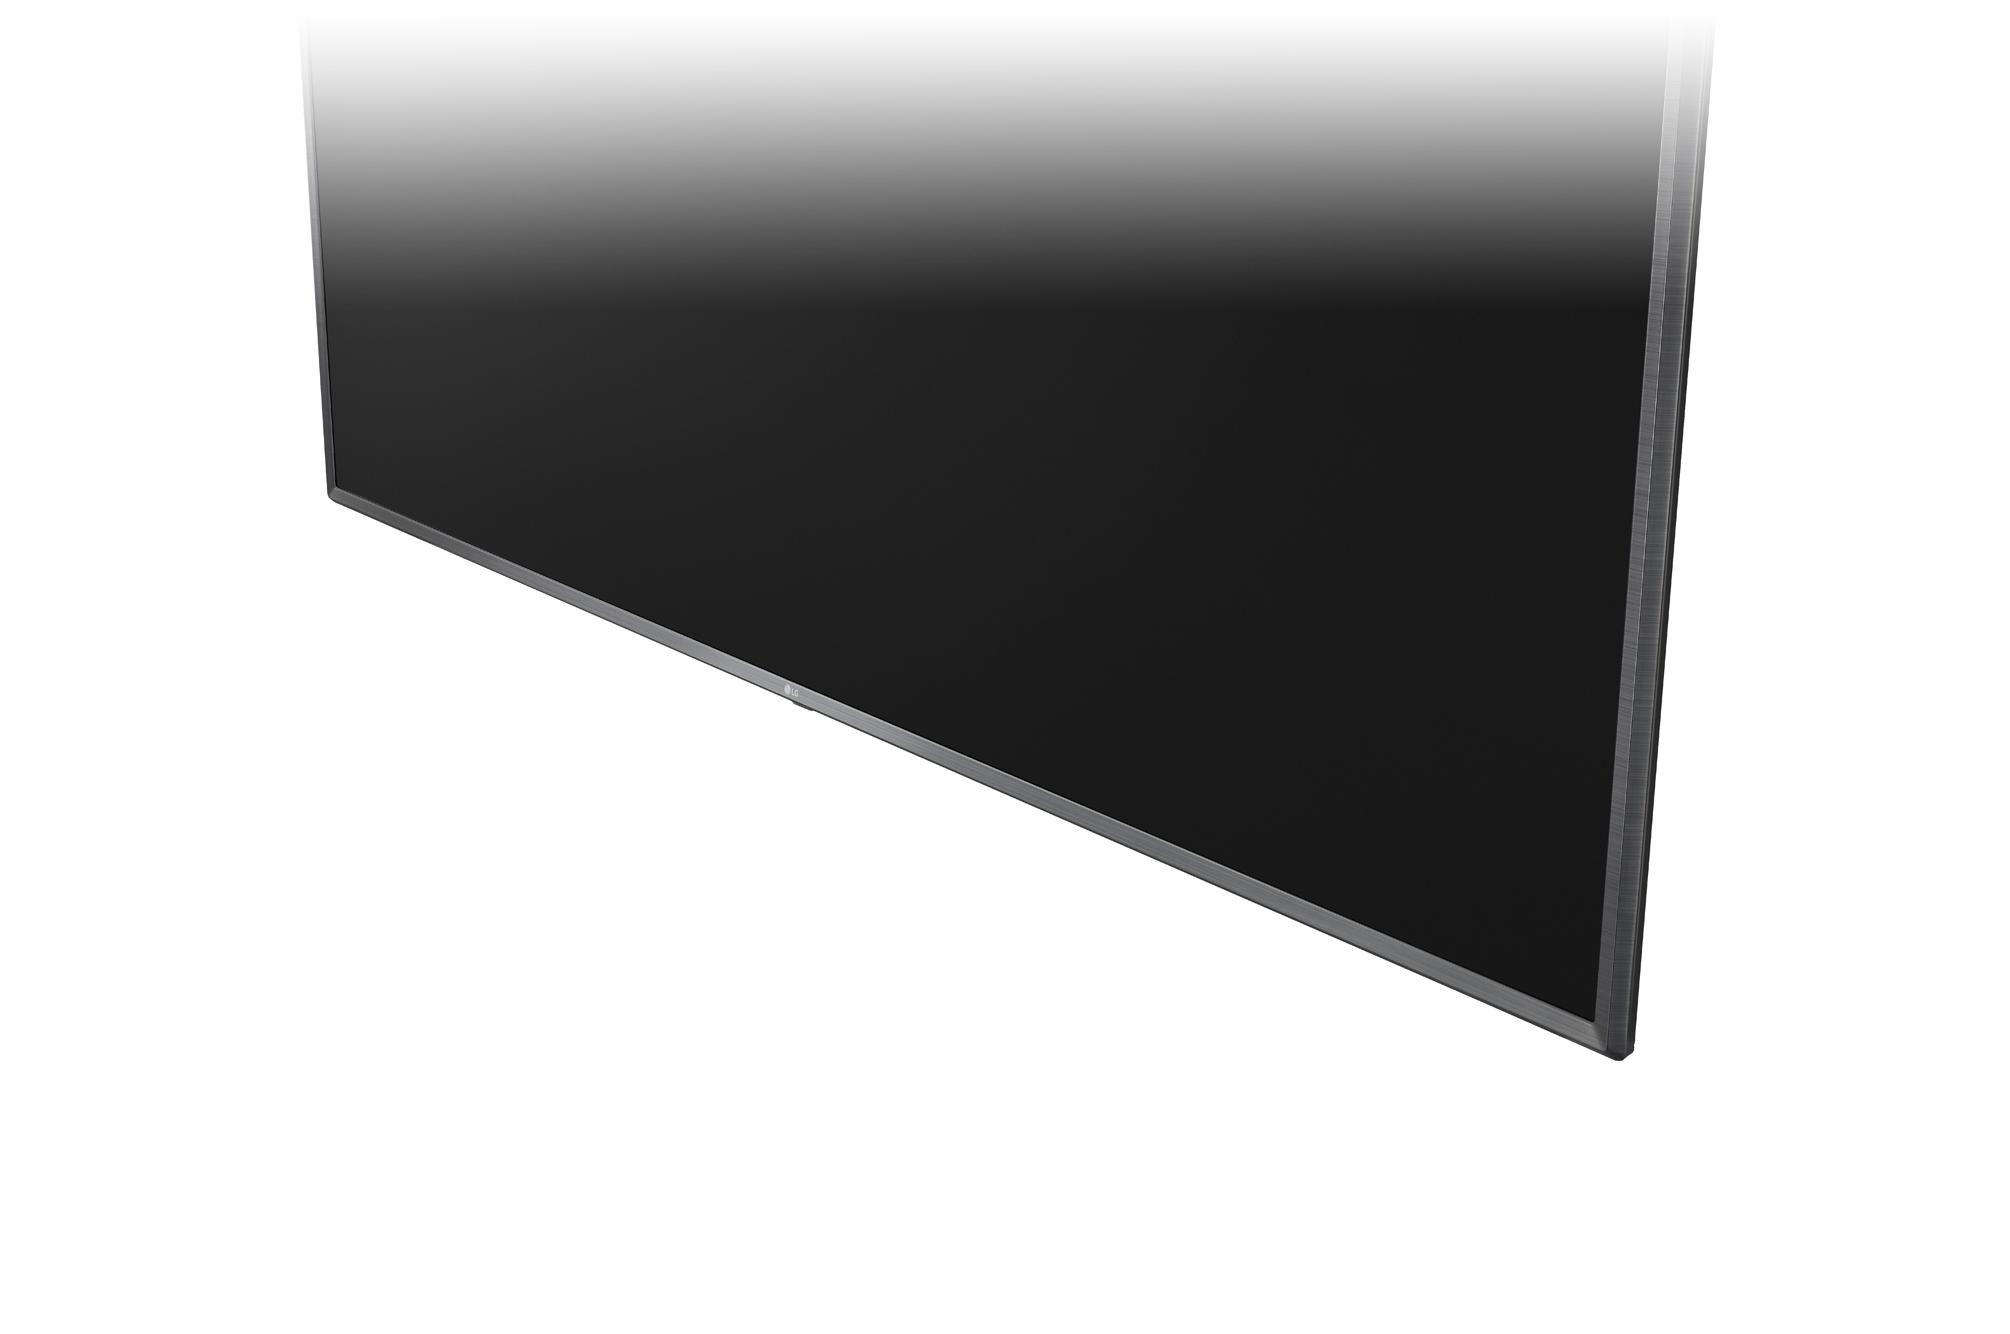 86UT640S (NA) | Smart TV Signage | TV Signage | Commercial